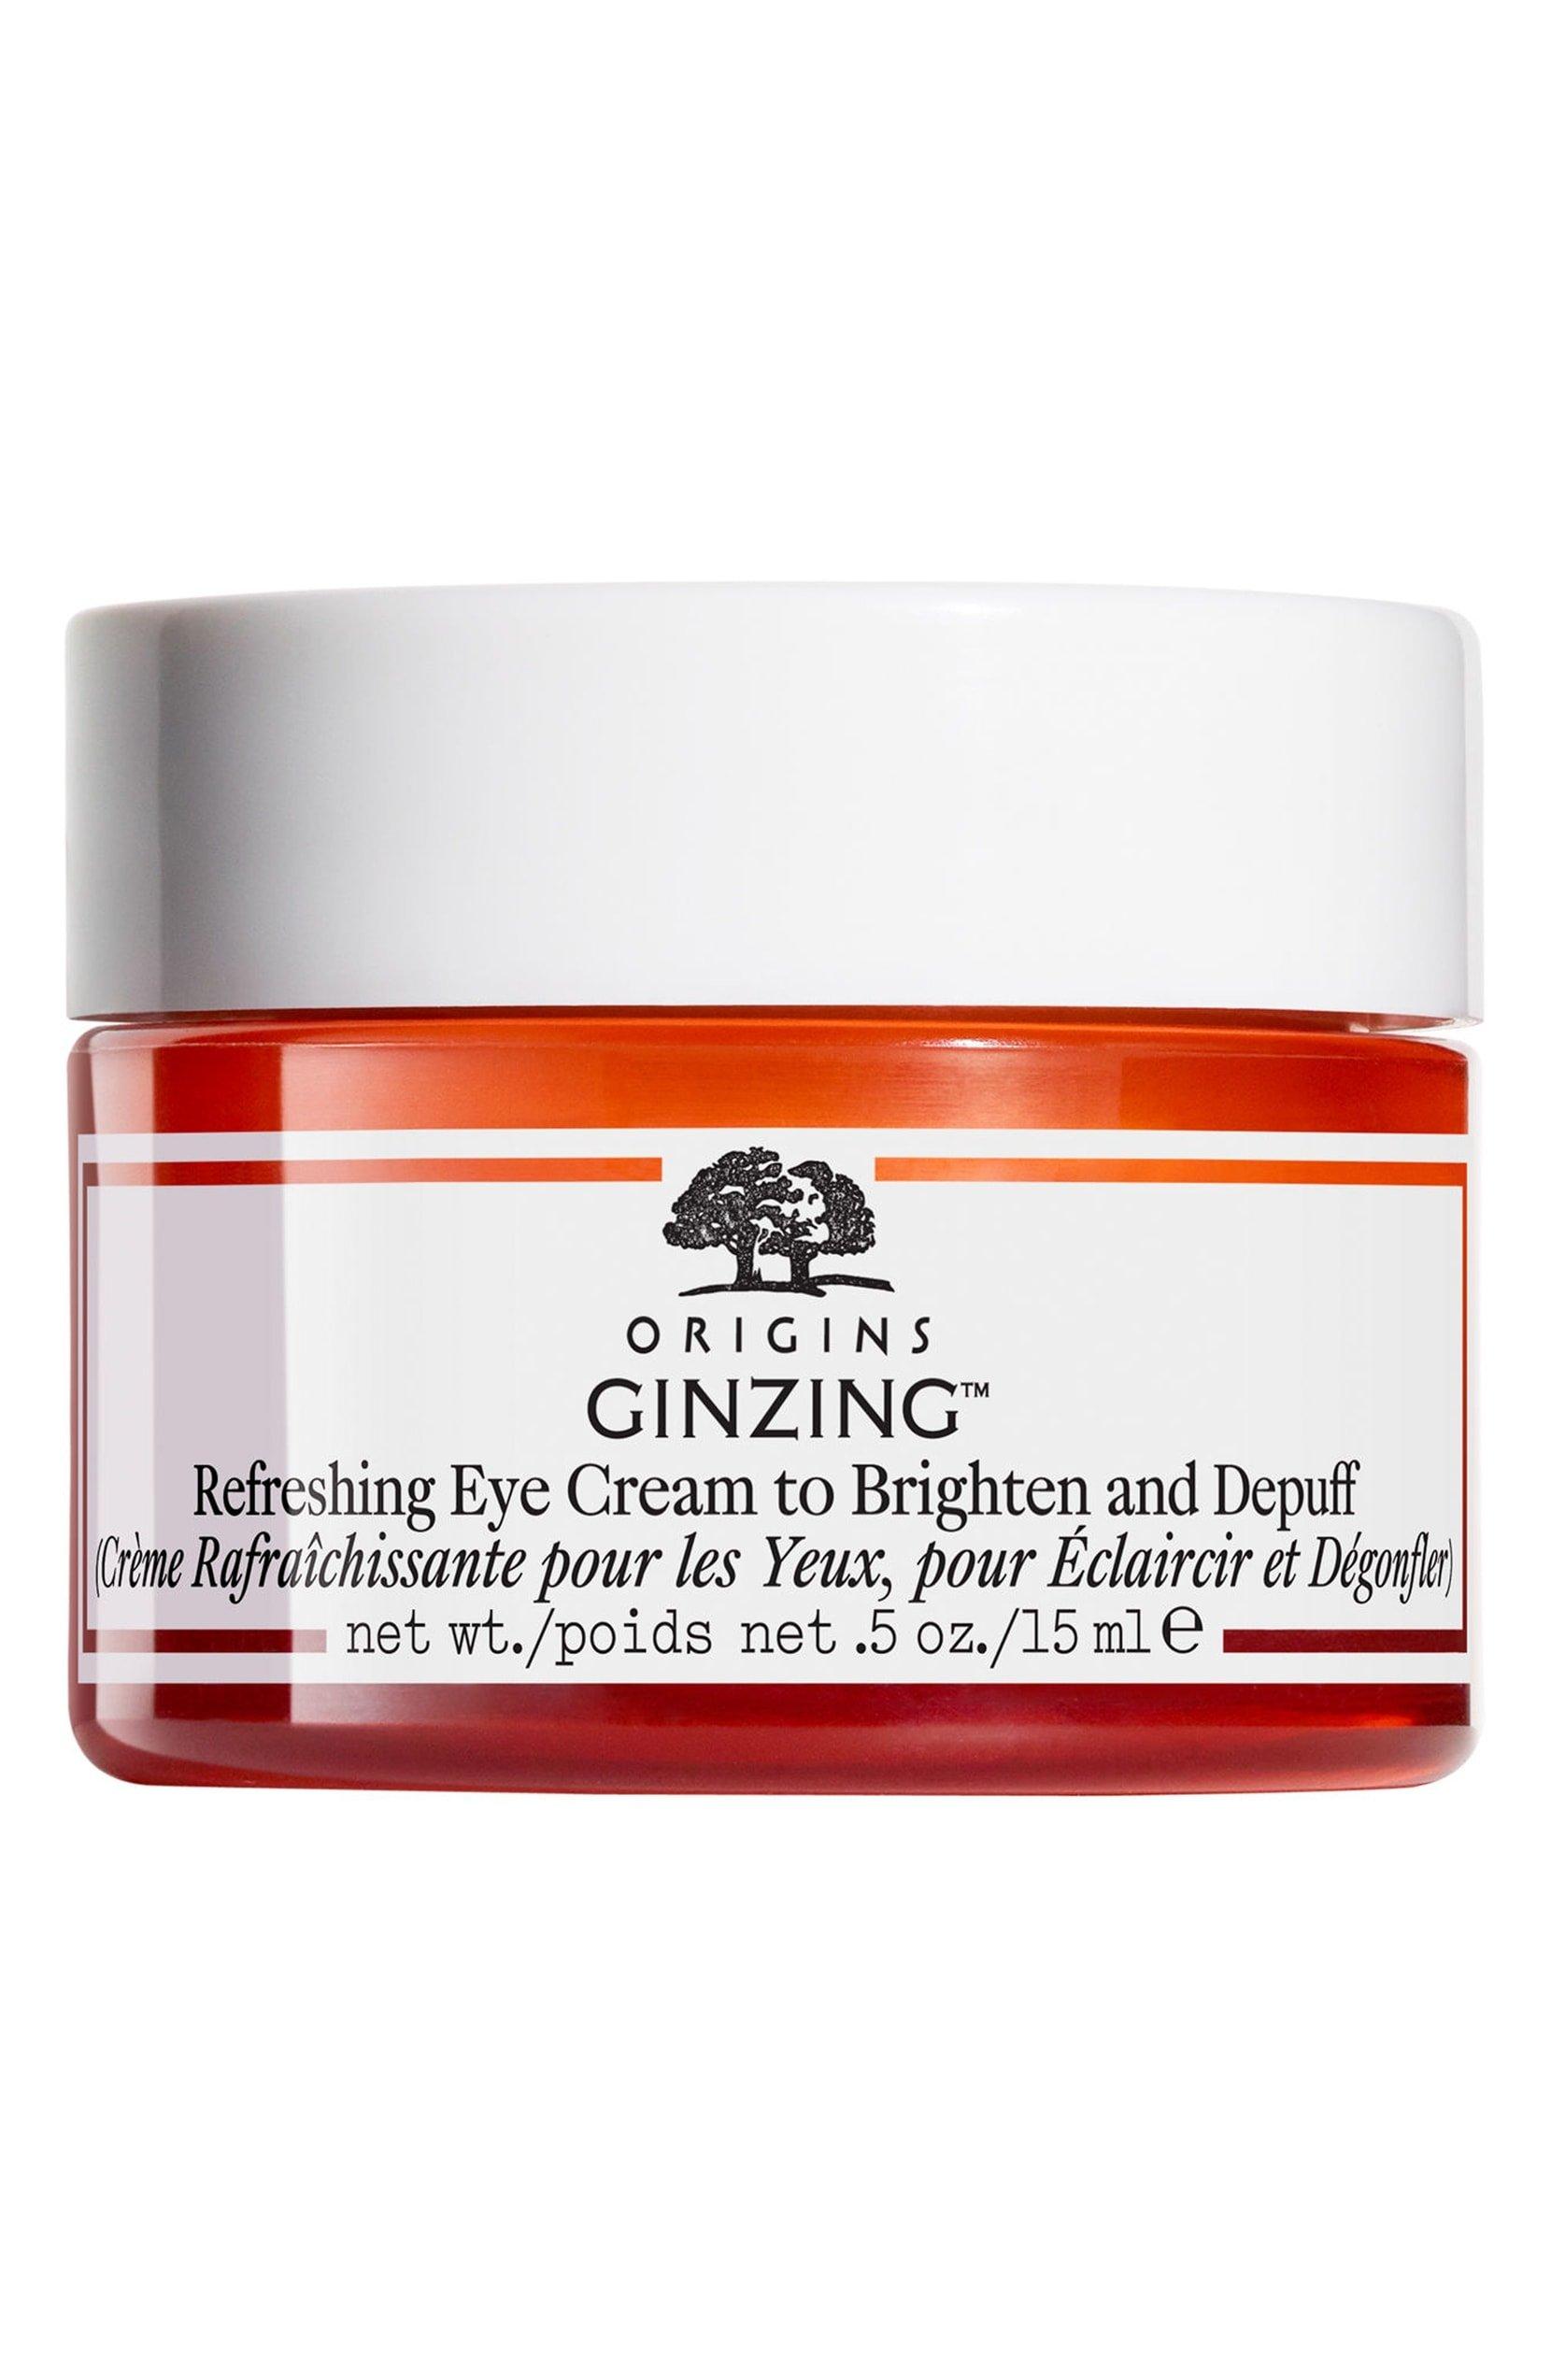 Origins Ginzing Refreshing Eye Cream To Brighten and Depuff By Origins for Unisex - 0.5 Oz Eye Cream, 0.5 Ounce by Origins